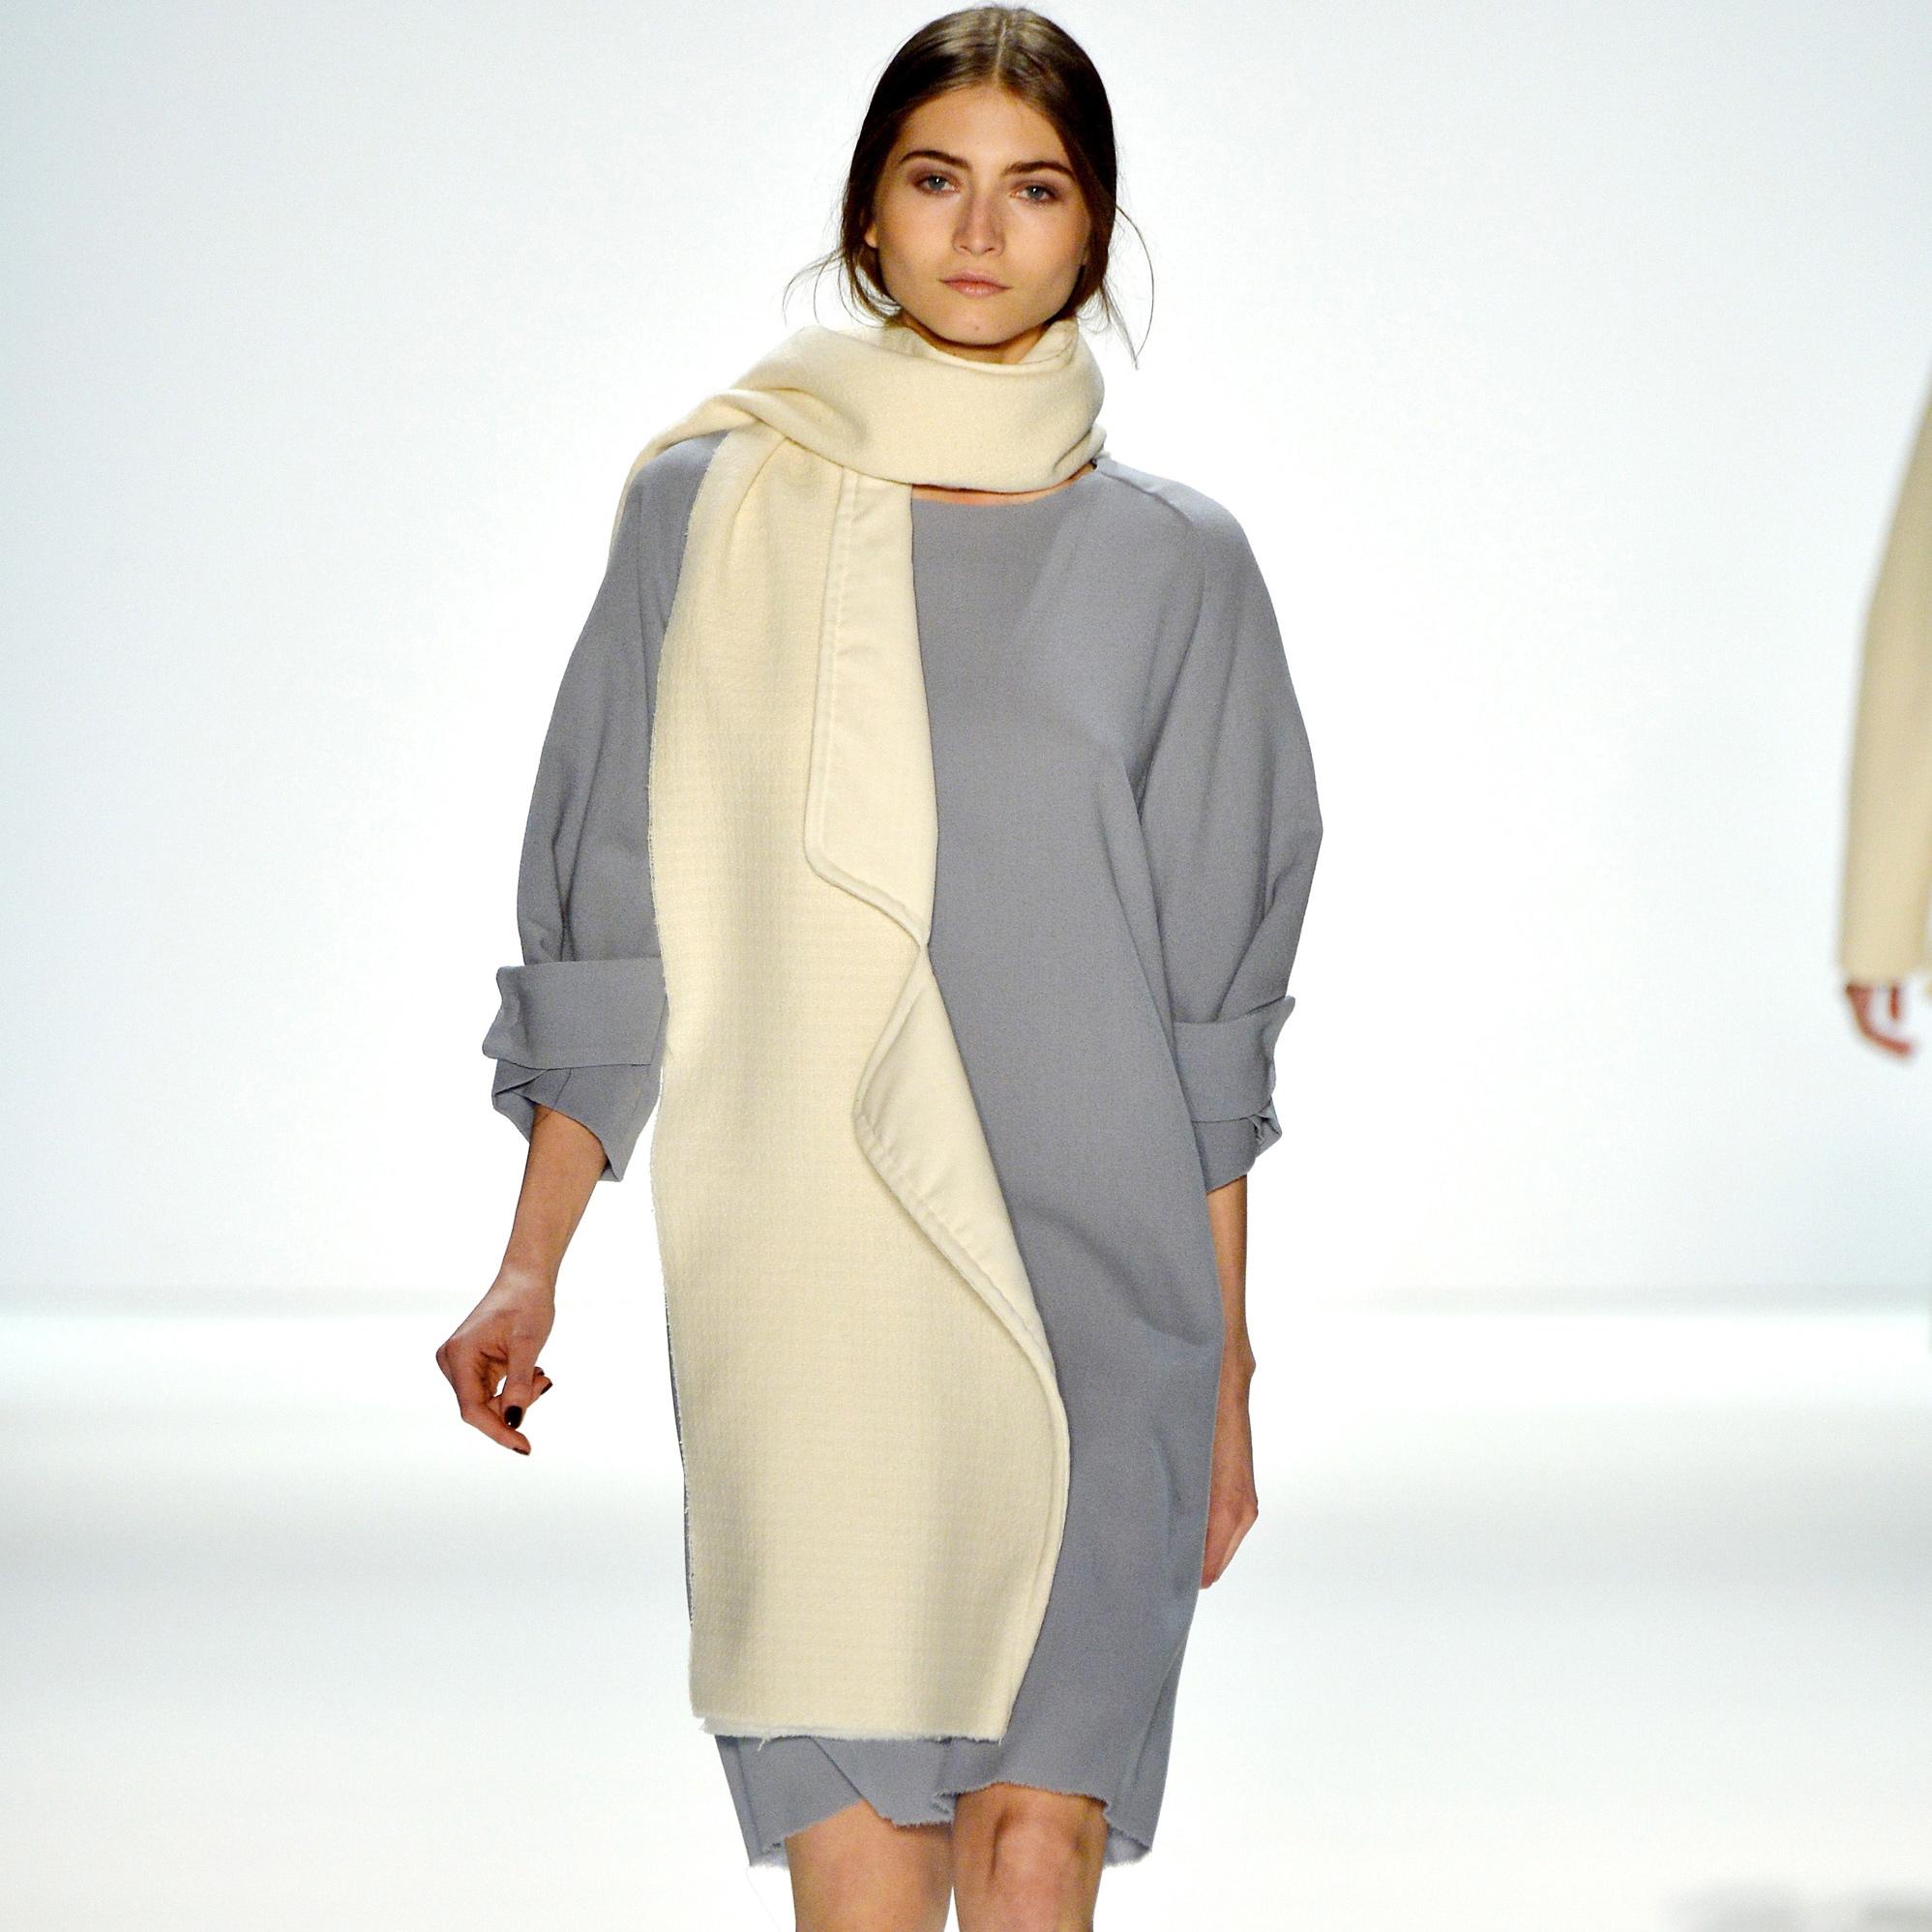 aw-2014_fashion-week-berlin_DE_vladimir-karaleev_42775